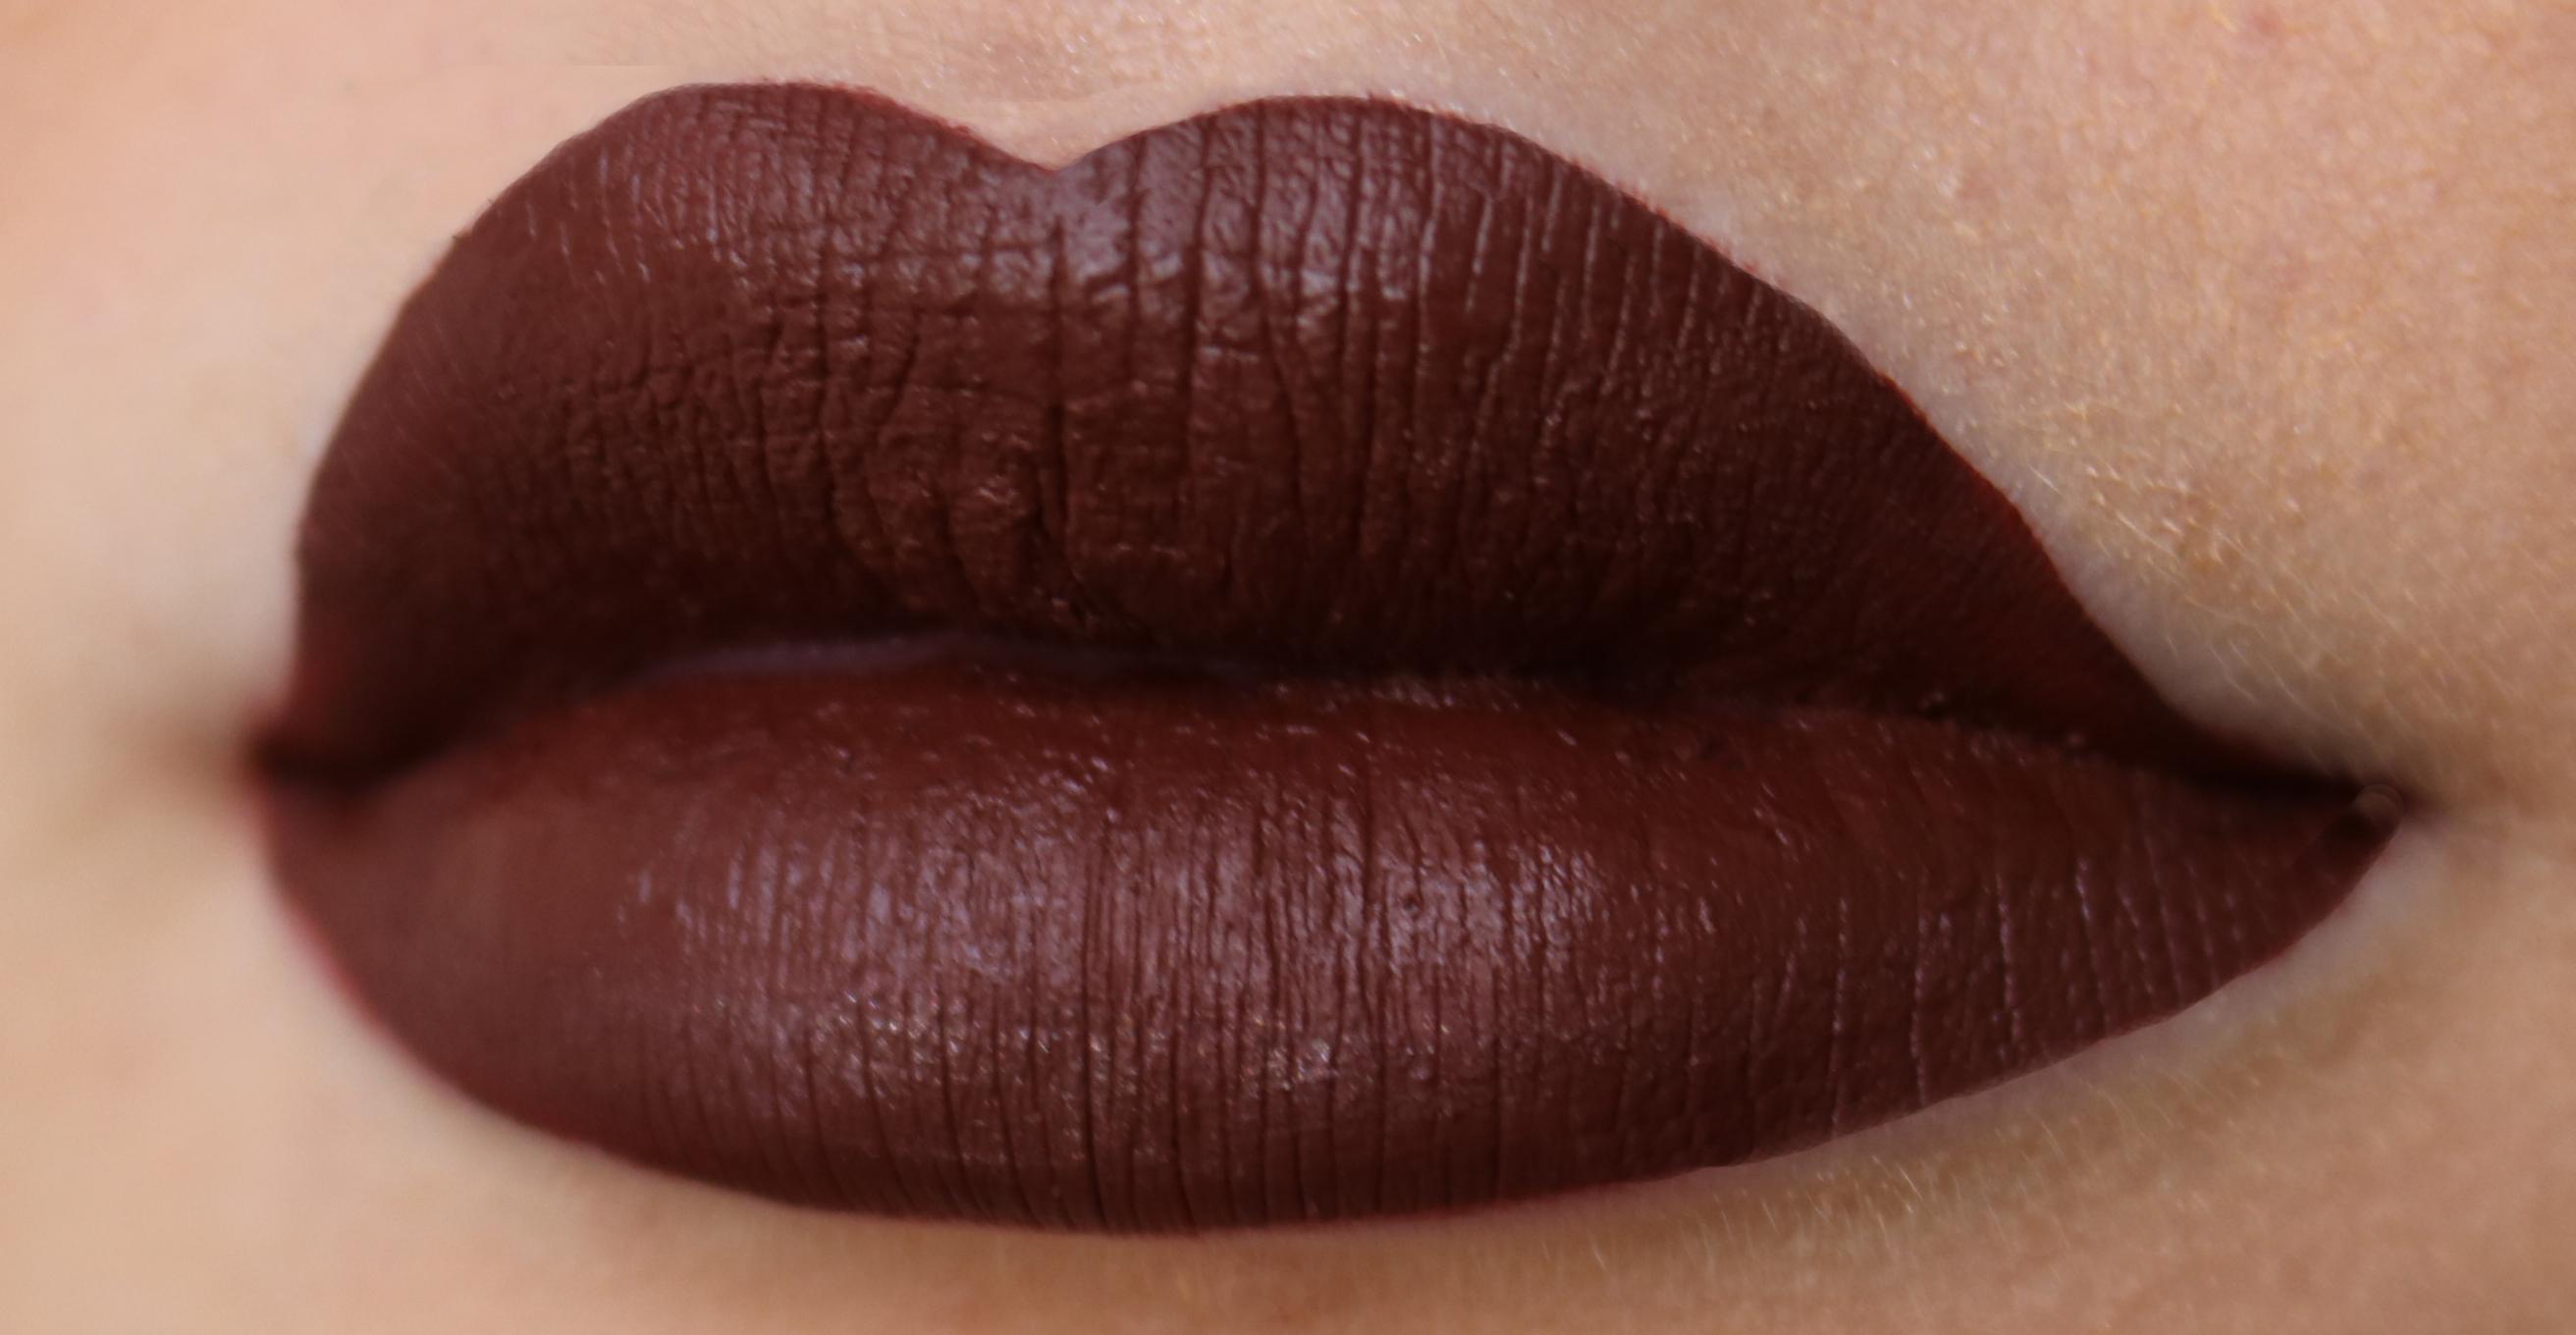 Anastasia Liquid Lipstick vamp test recension amandahans skönhetsblogg